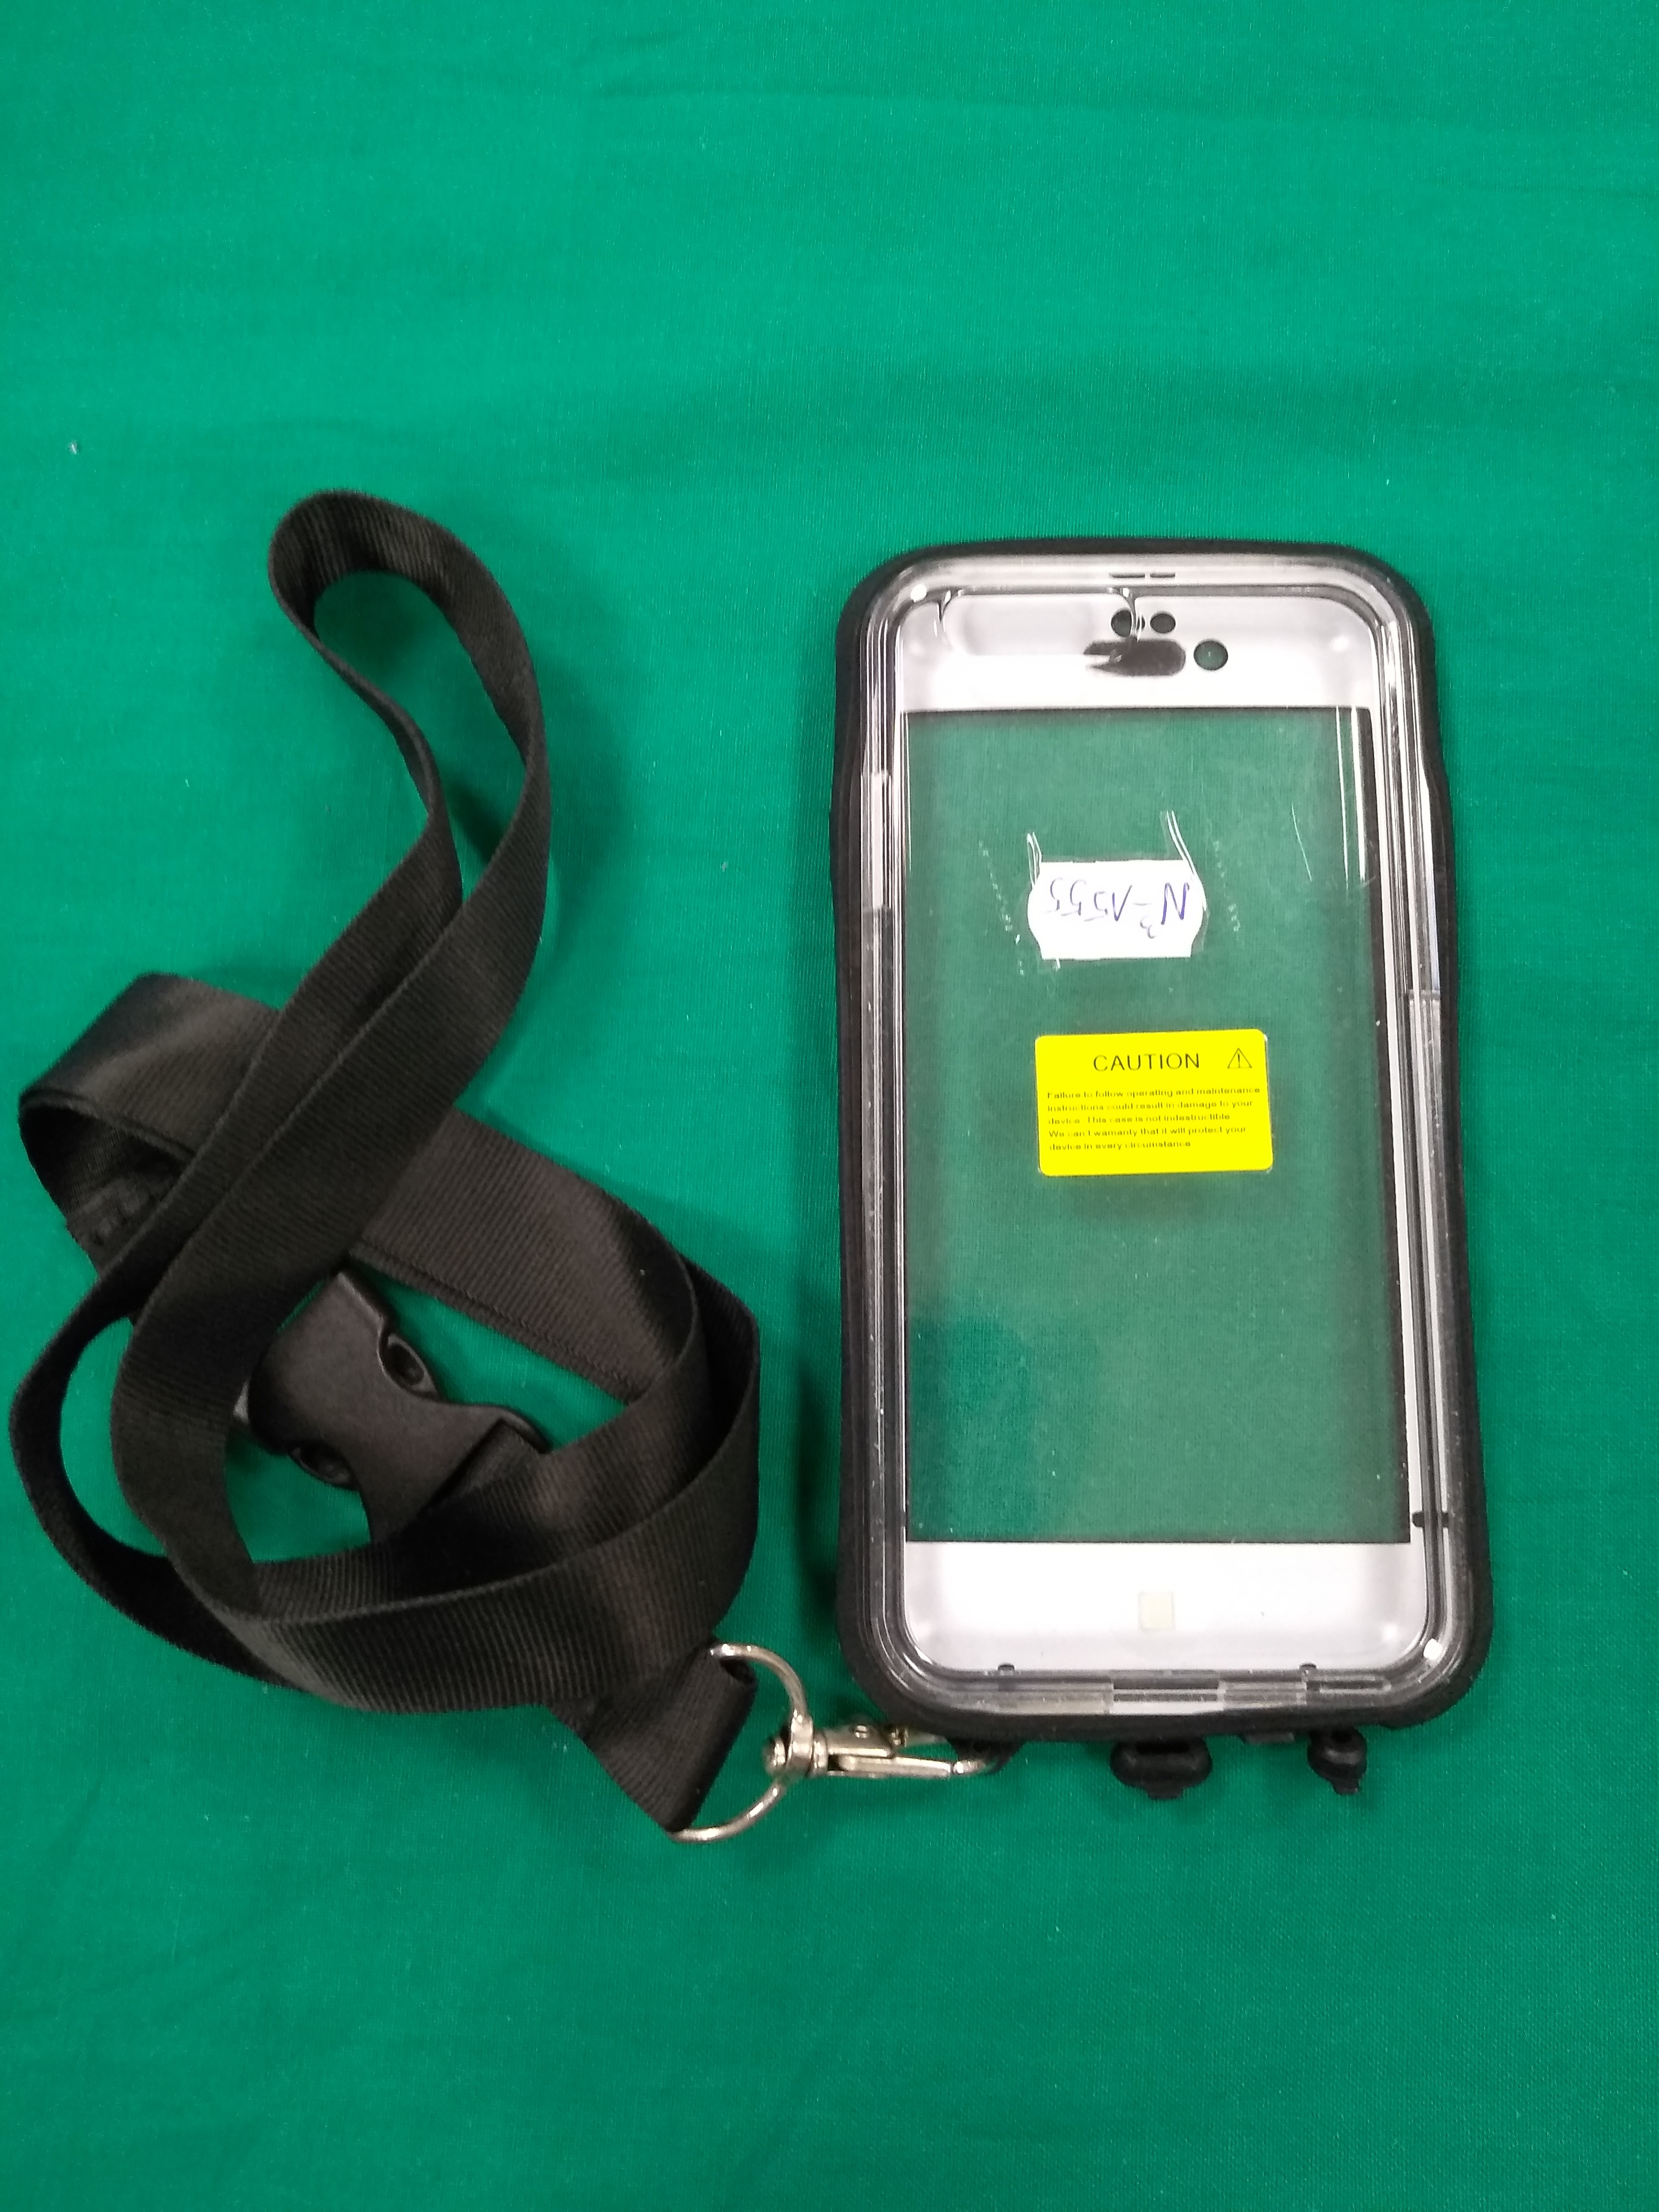 Slim Pearl Iphone 6 tok nyakpánttal, kiemelt kép